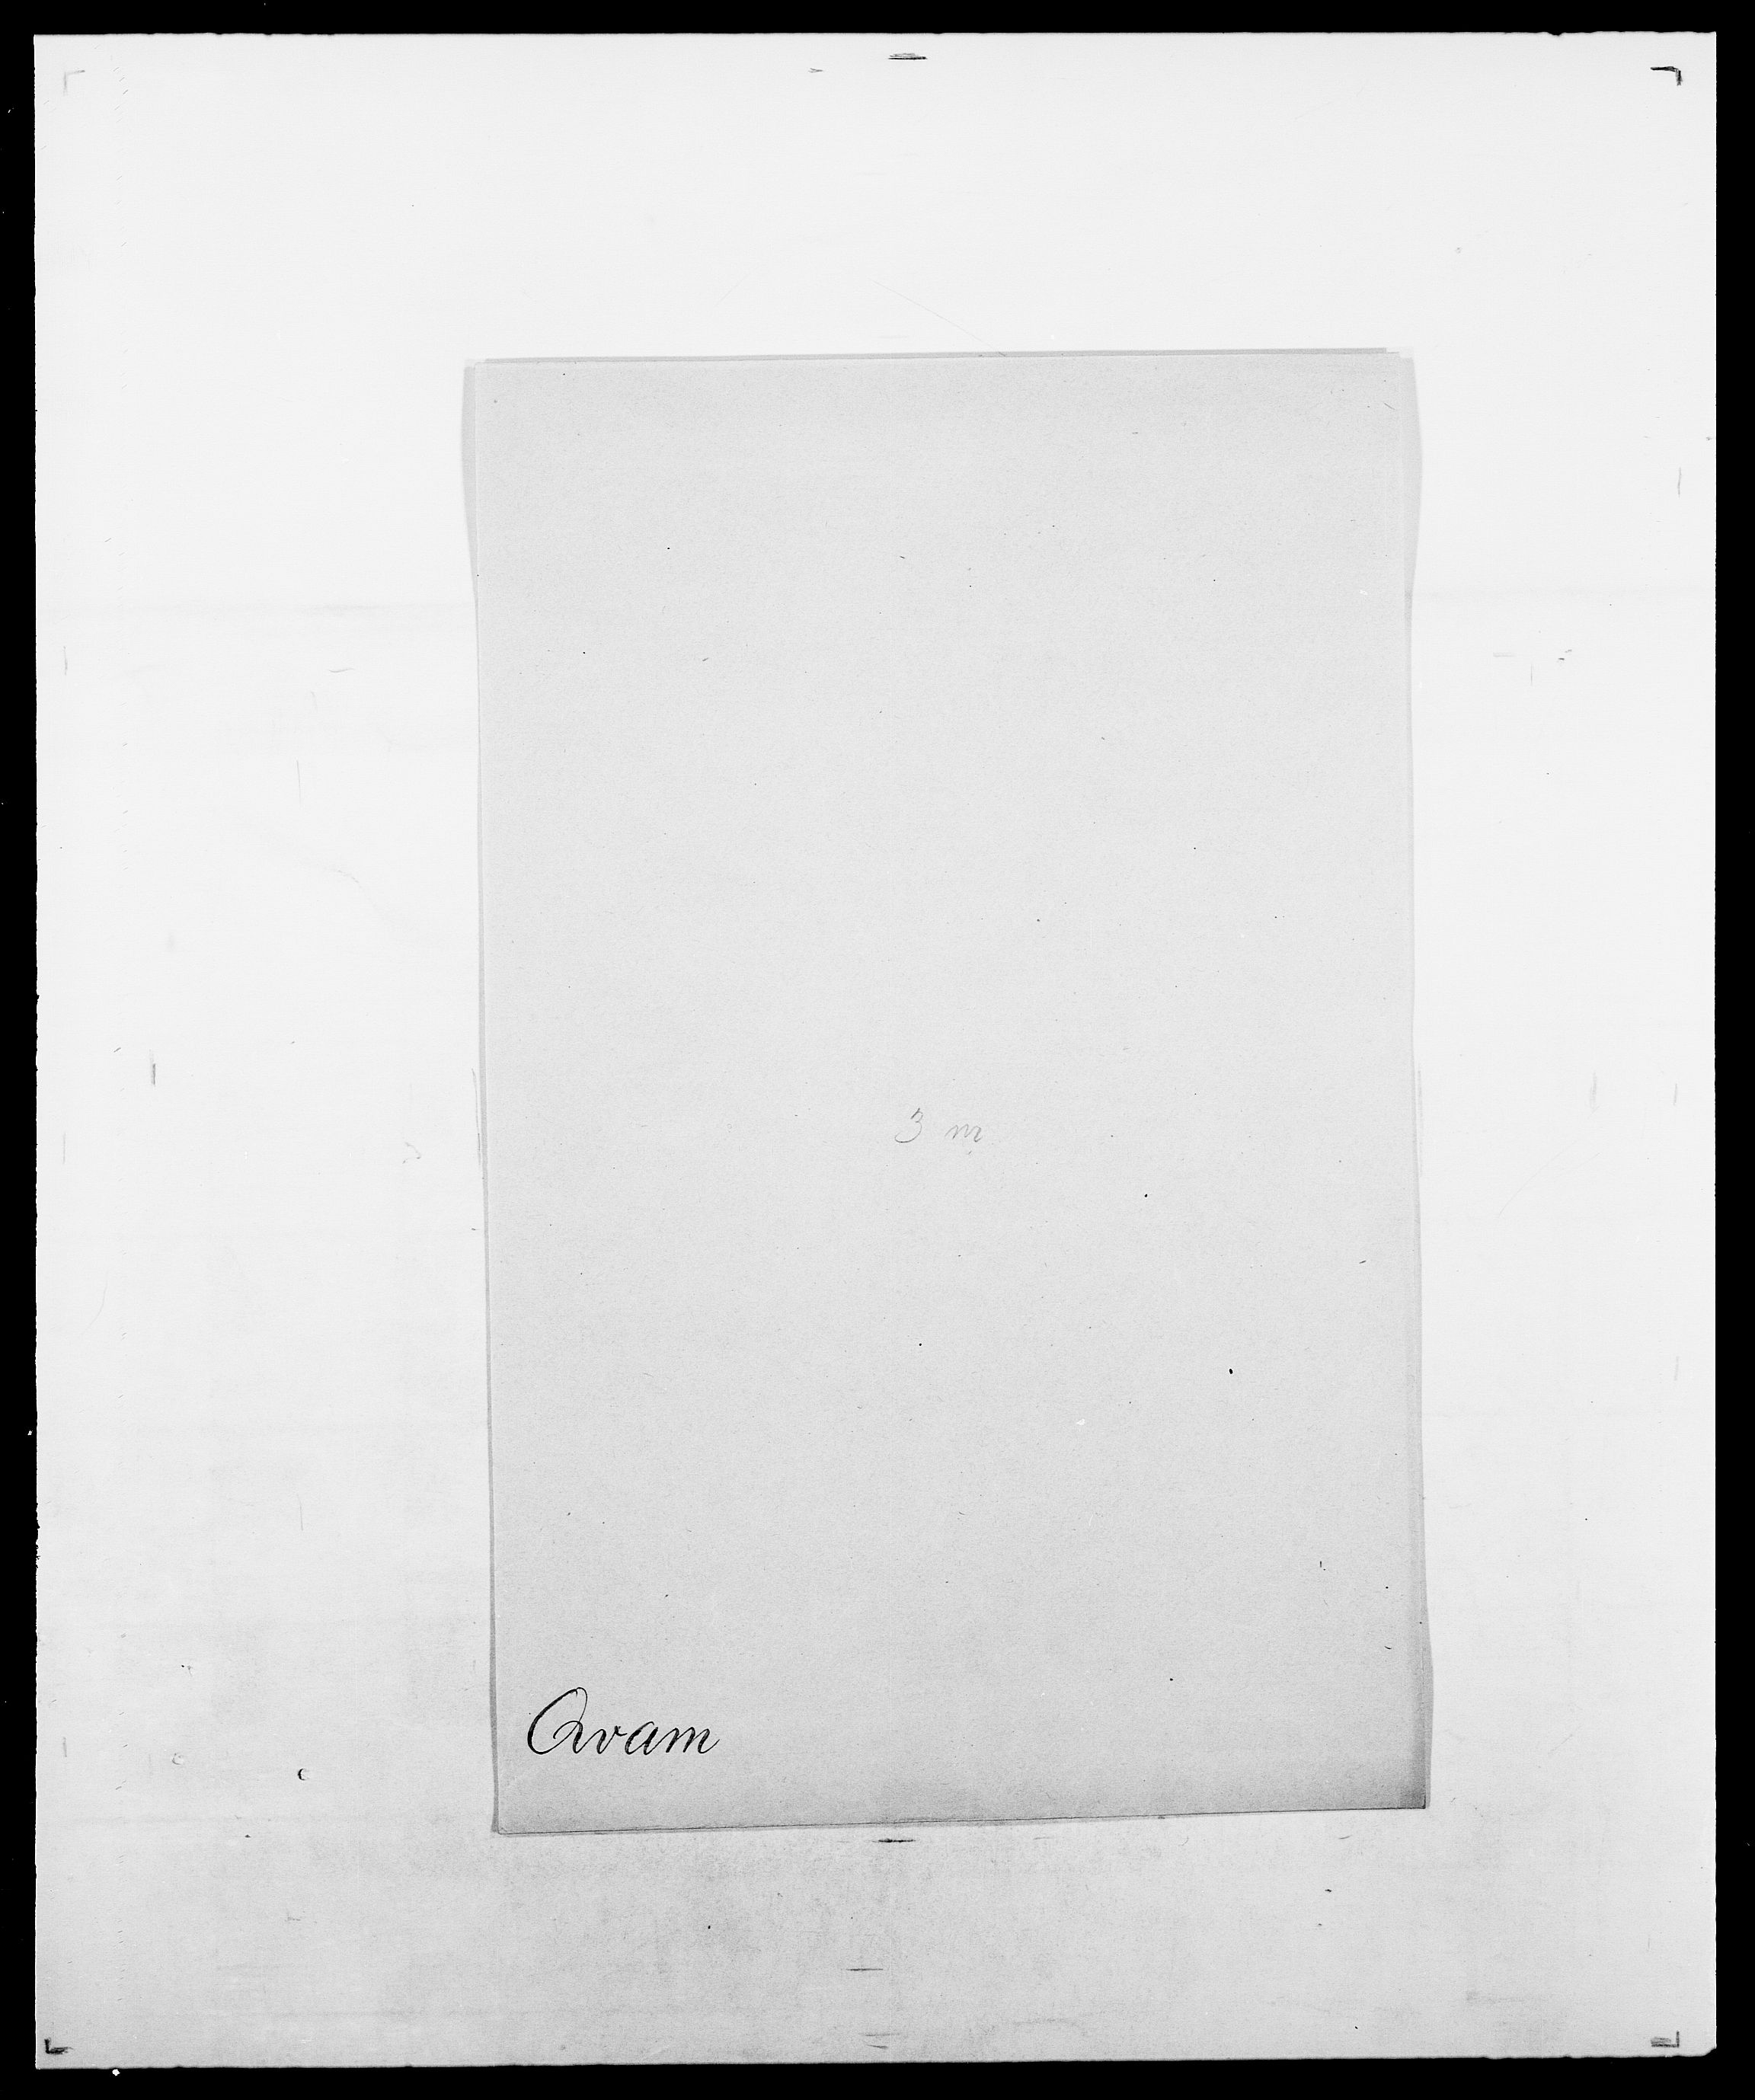 SAO, Delgobe, Charles Antoine - samling, D/Da/L0031: de Place - Raaum, s. 493